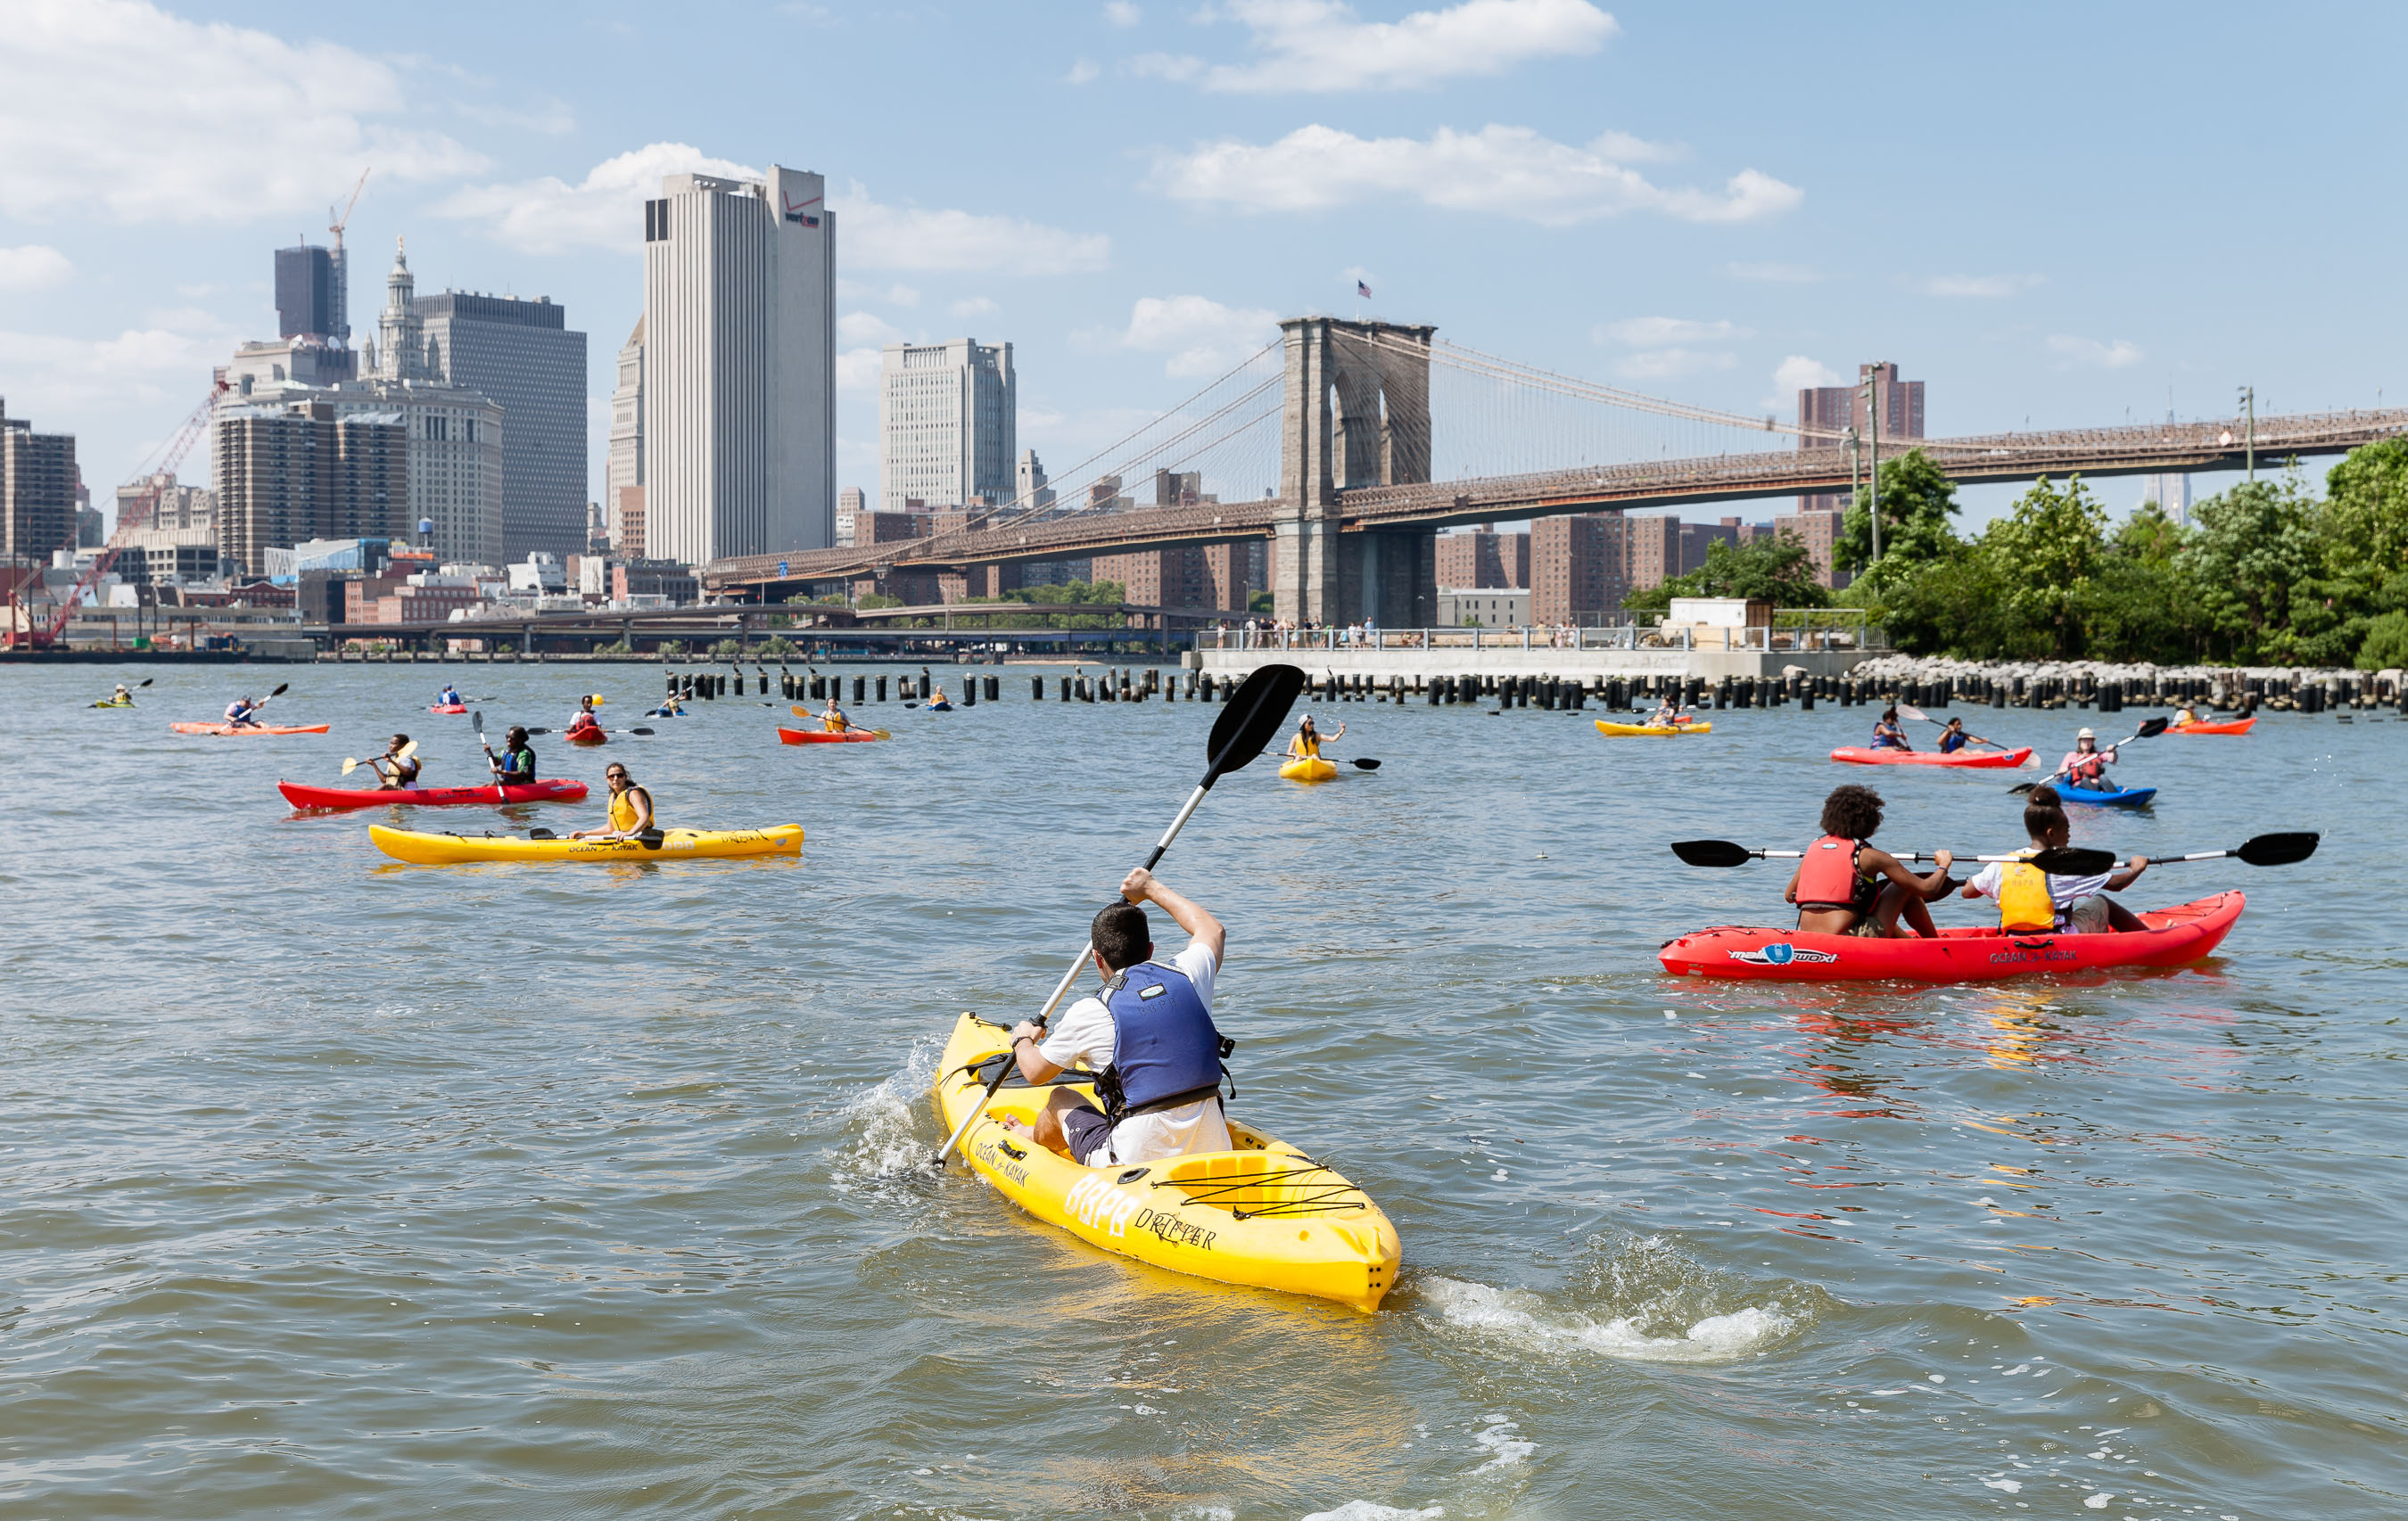 Brooklyn Bridge Park Summer Events and Activities